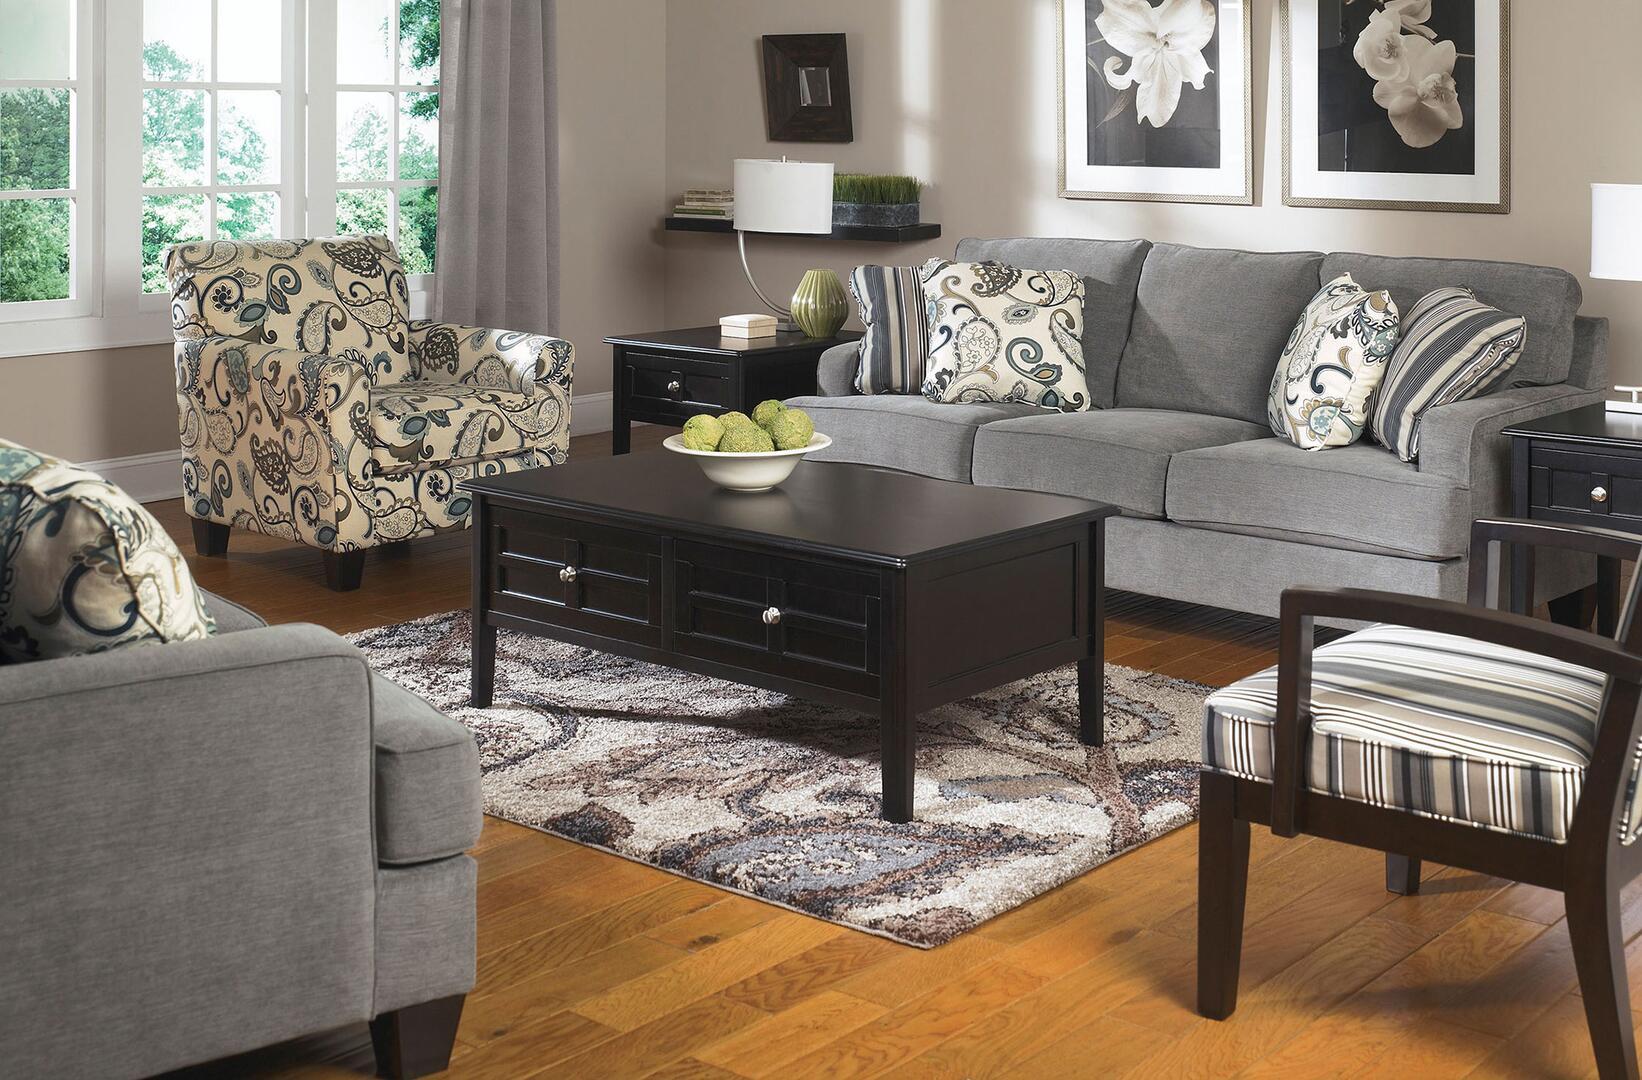 Ashley 77900kit4pc3 yvette living room sets appliances for Living room of satoshi tax